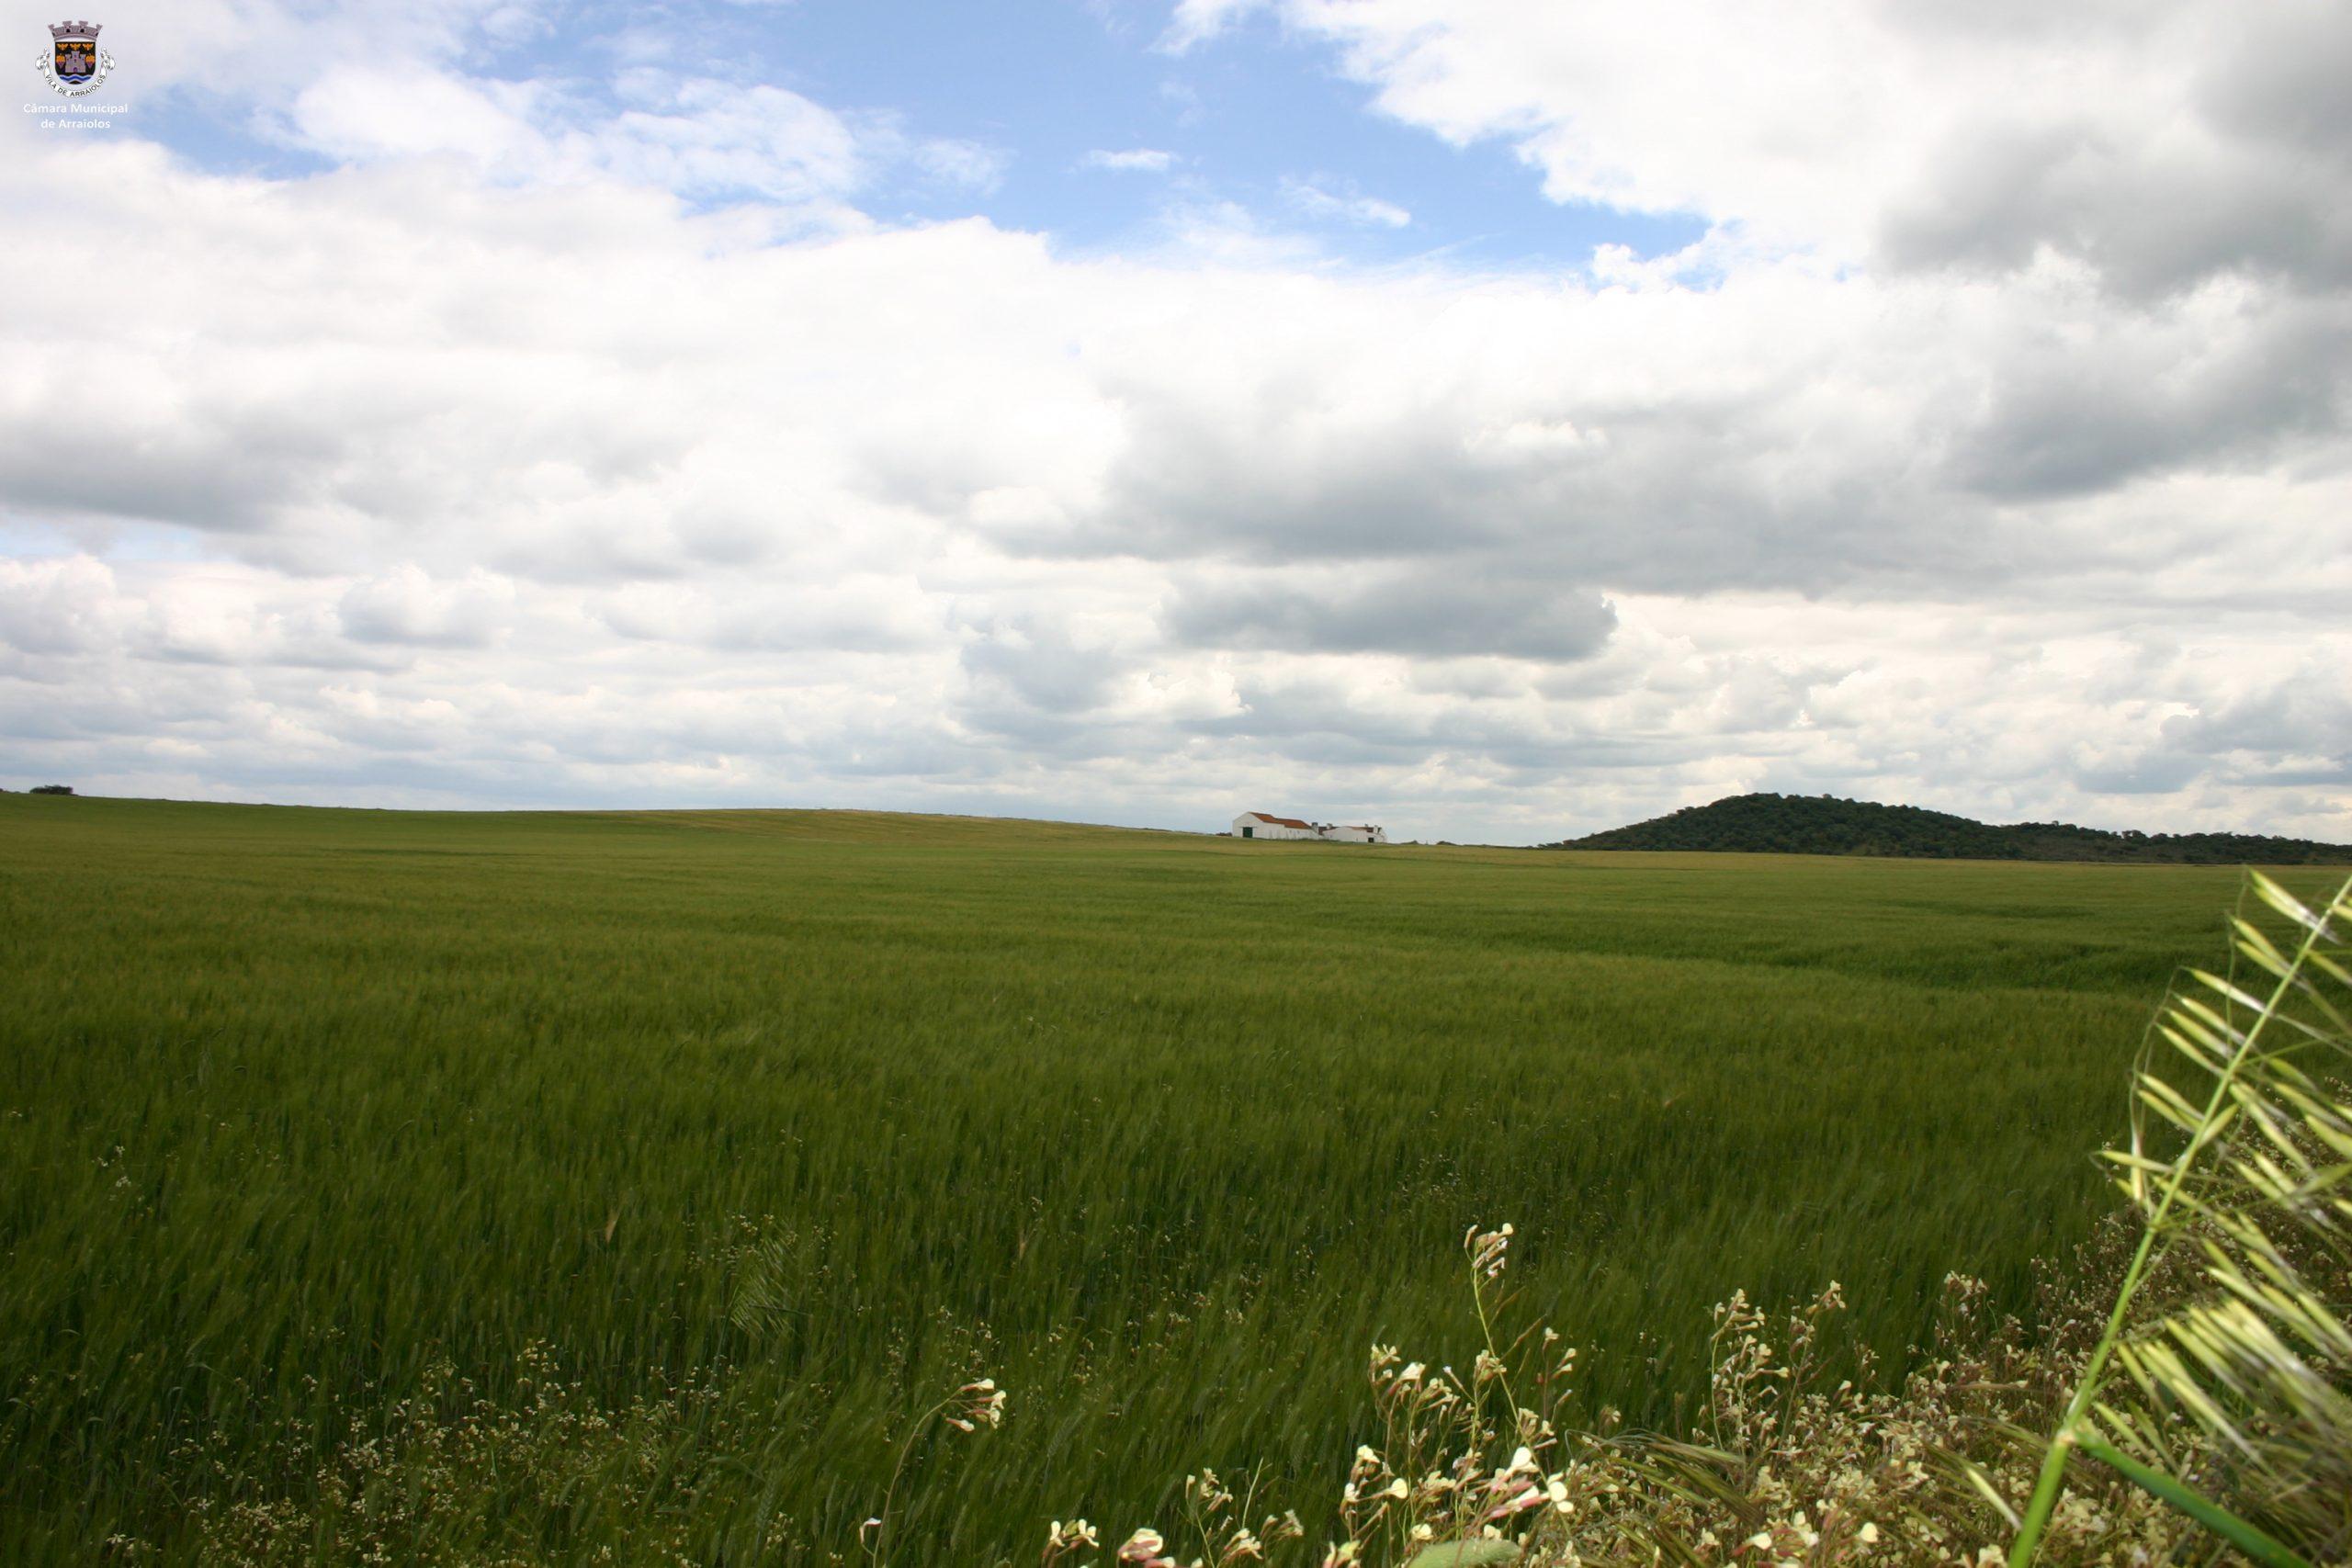 Ecopista de Arraiolos